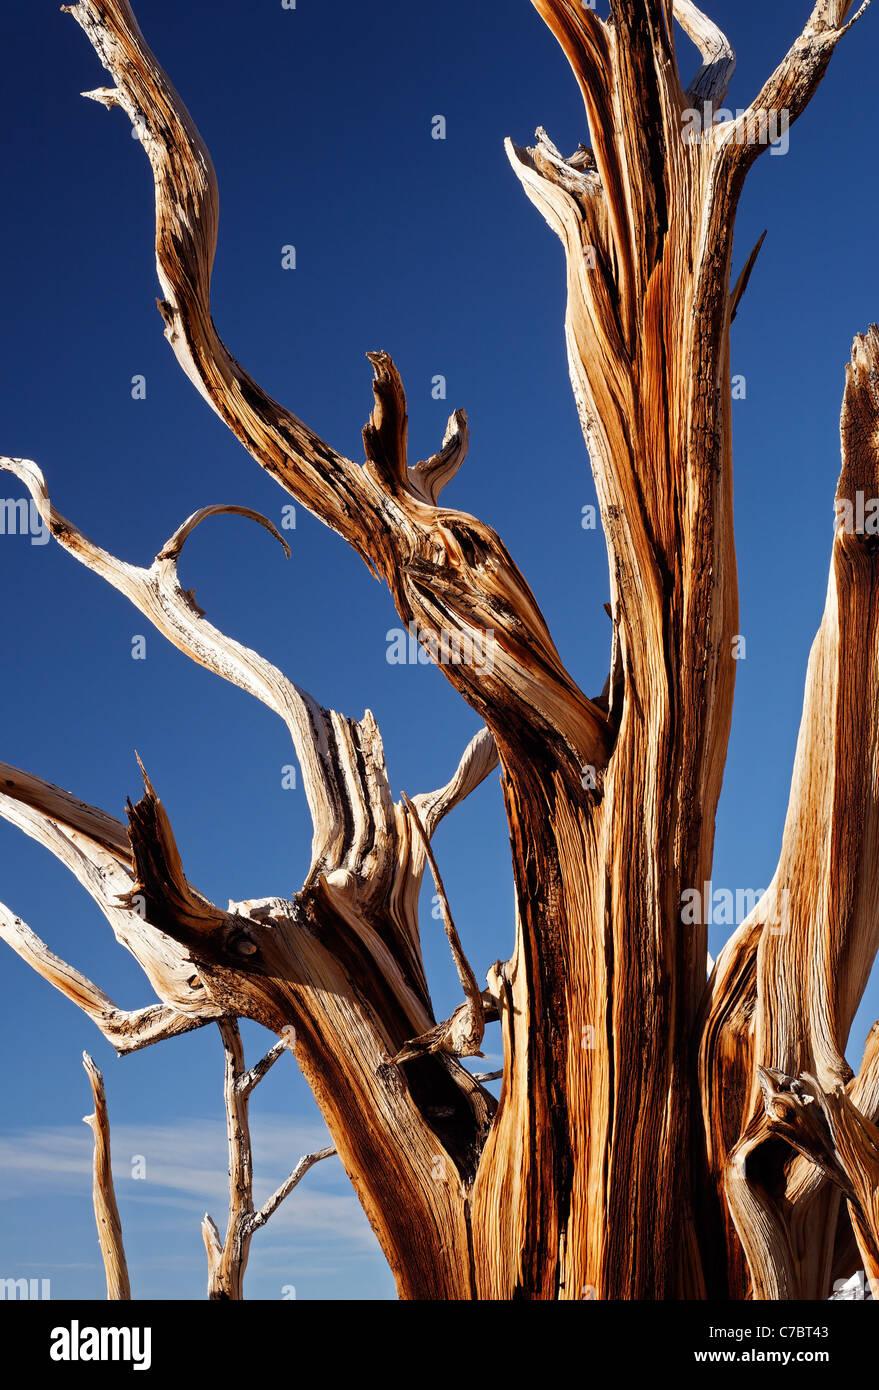 Bristlecone pine, Inyo National Forest, White Mountains, CALIFORNIA, STATI UNITI D'AMERICA Immagini Stock